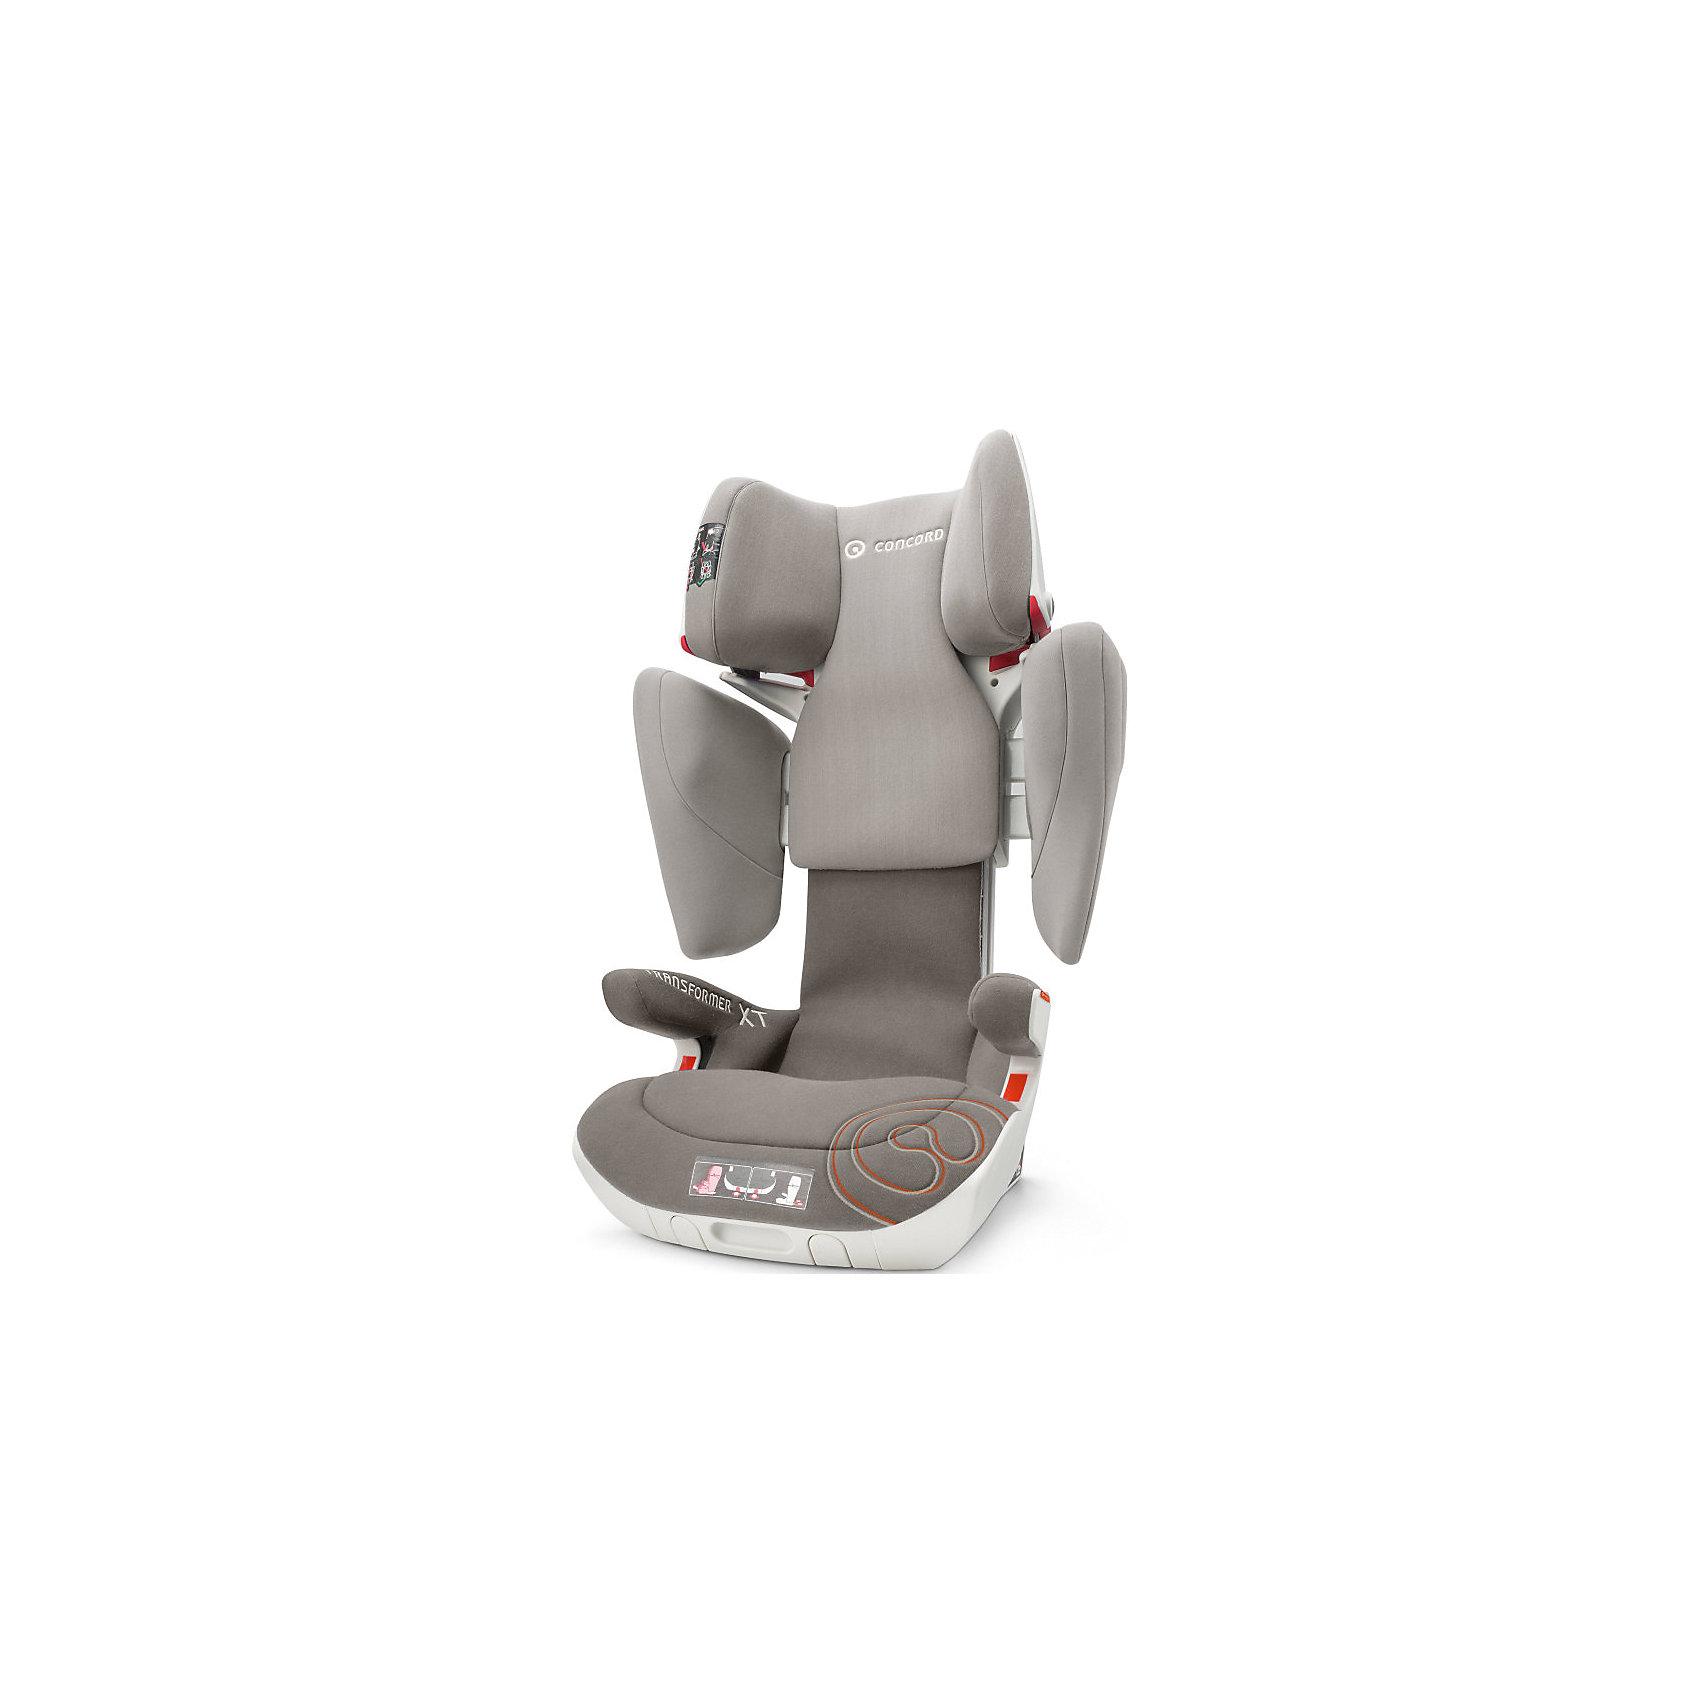 Автокресло Concord Transformer XT, 15-36 кг, Cool Beige 2016